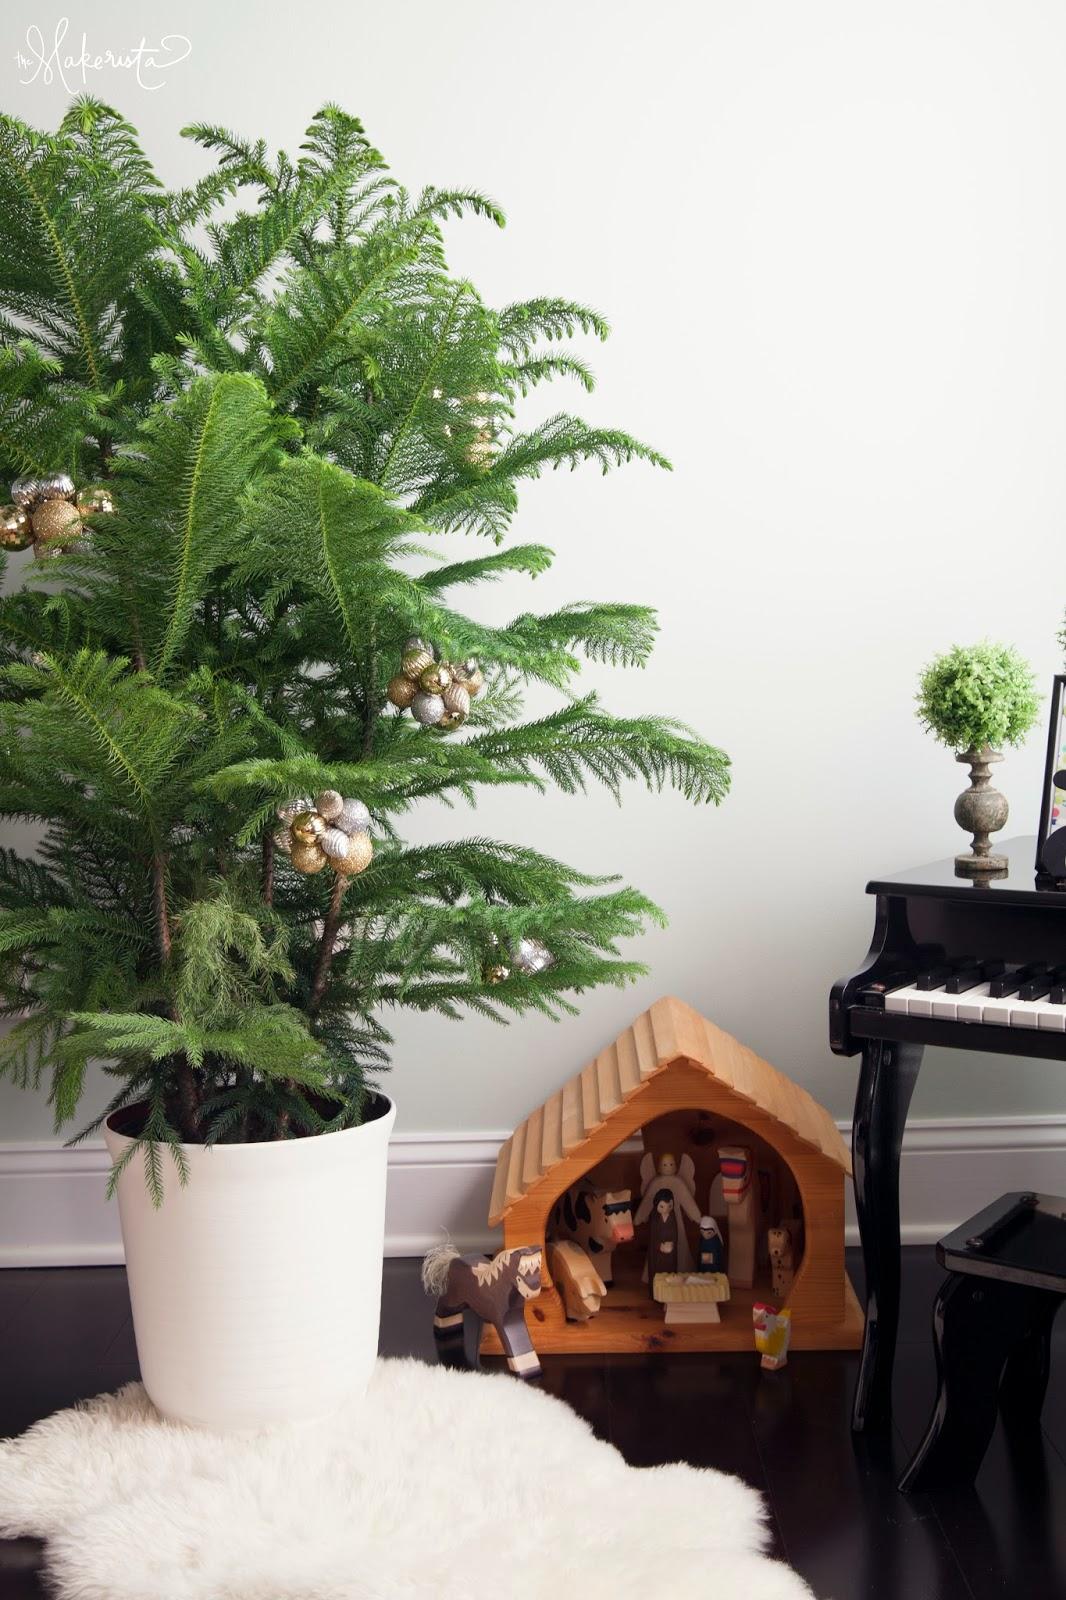 The Makerista Christmas Tree Ornament